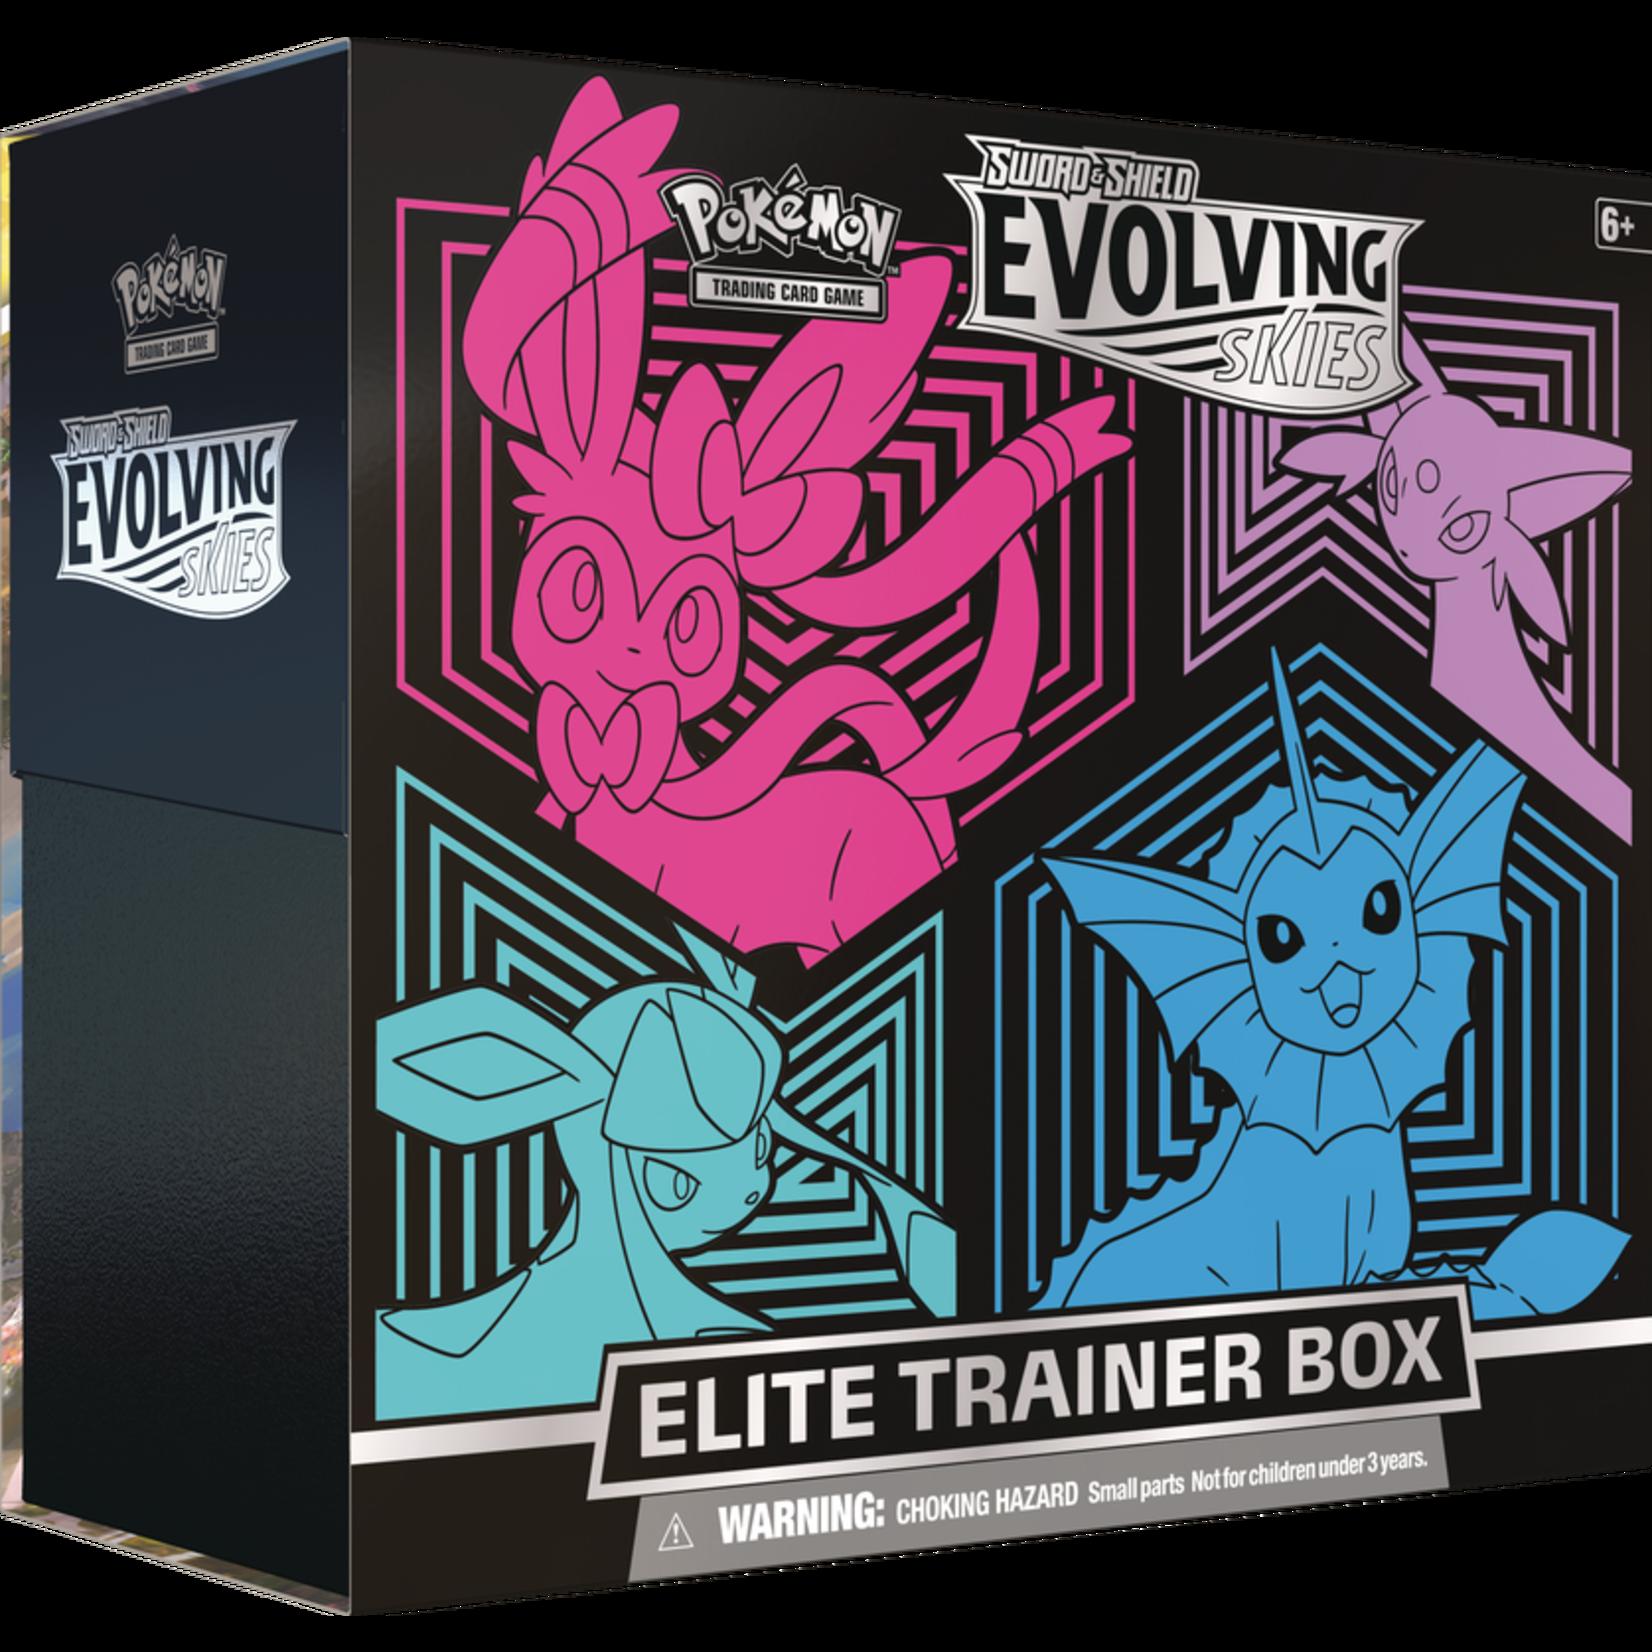 The Pokemon Company [Preorder] EVOLVING SKIES ELITE TRAINER BOX